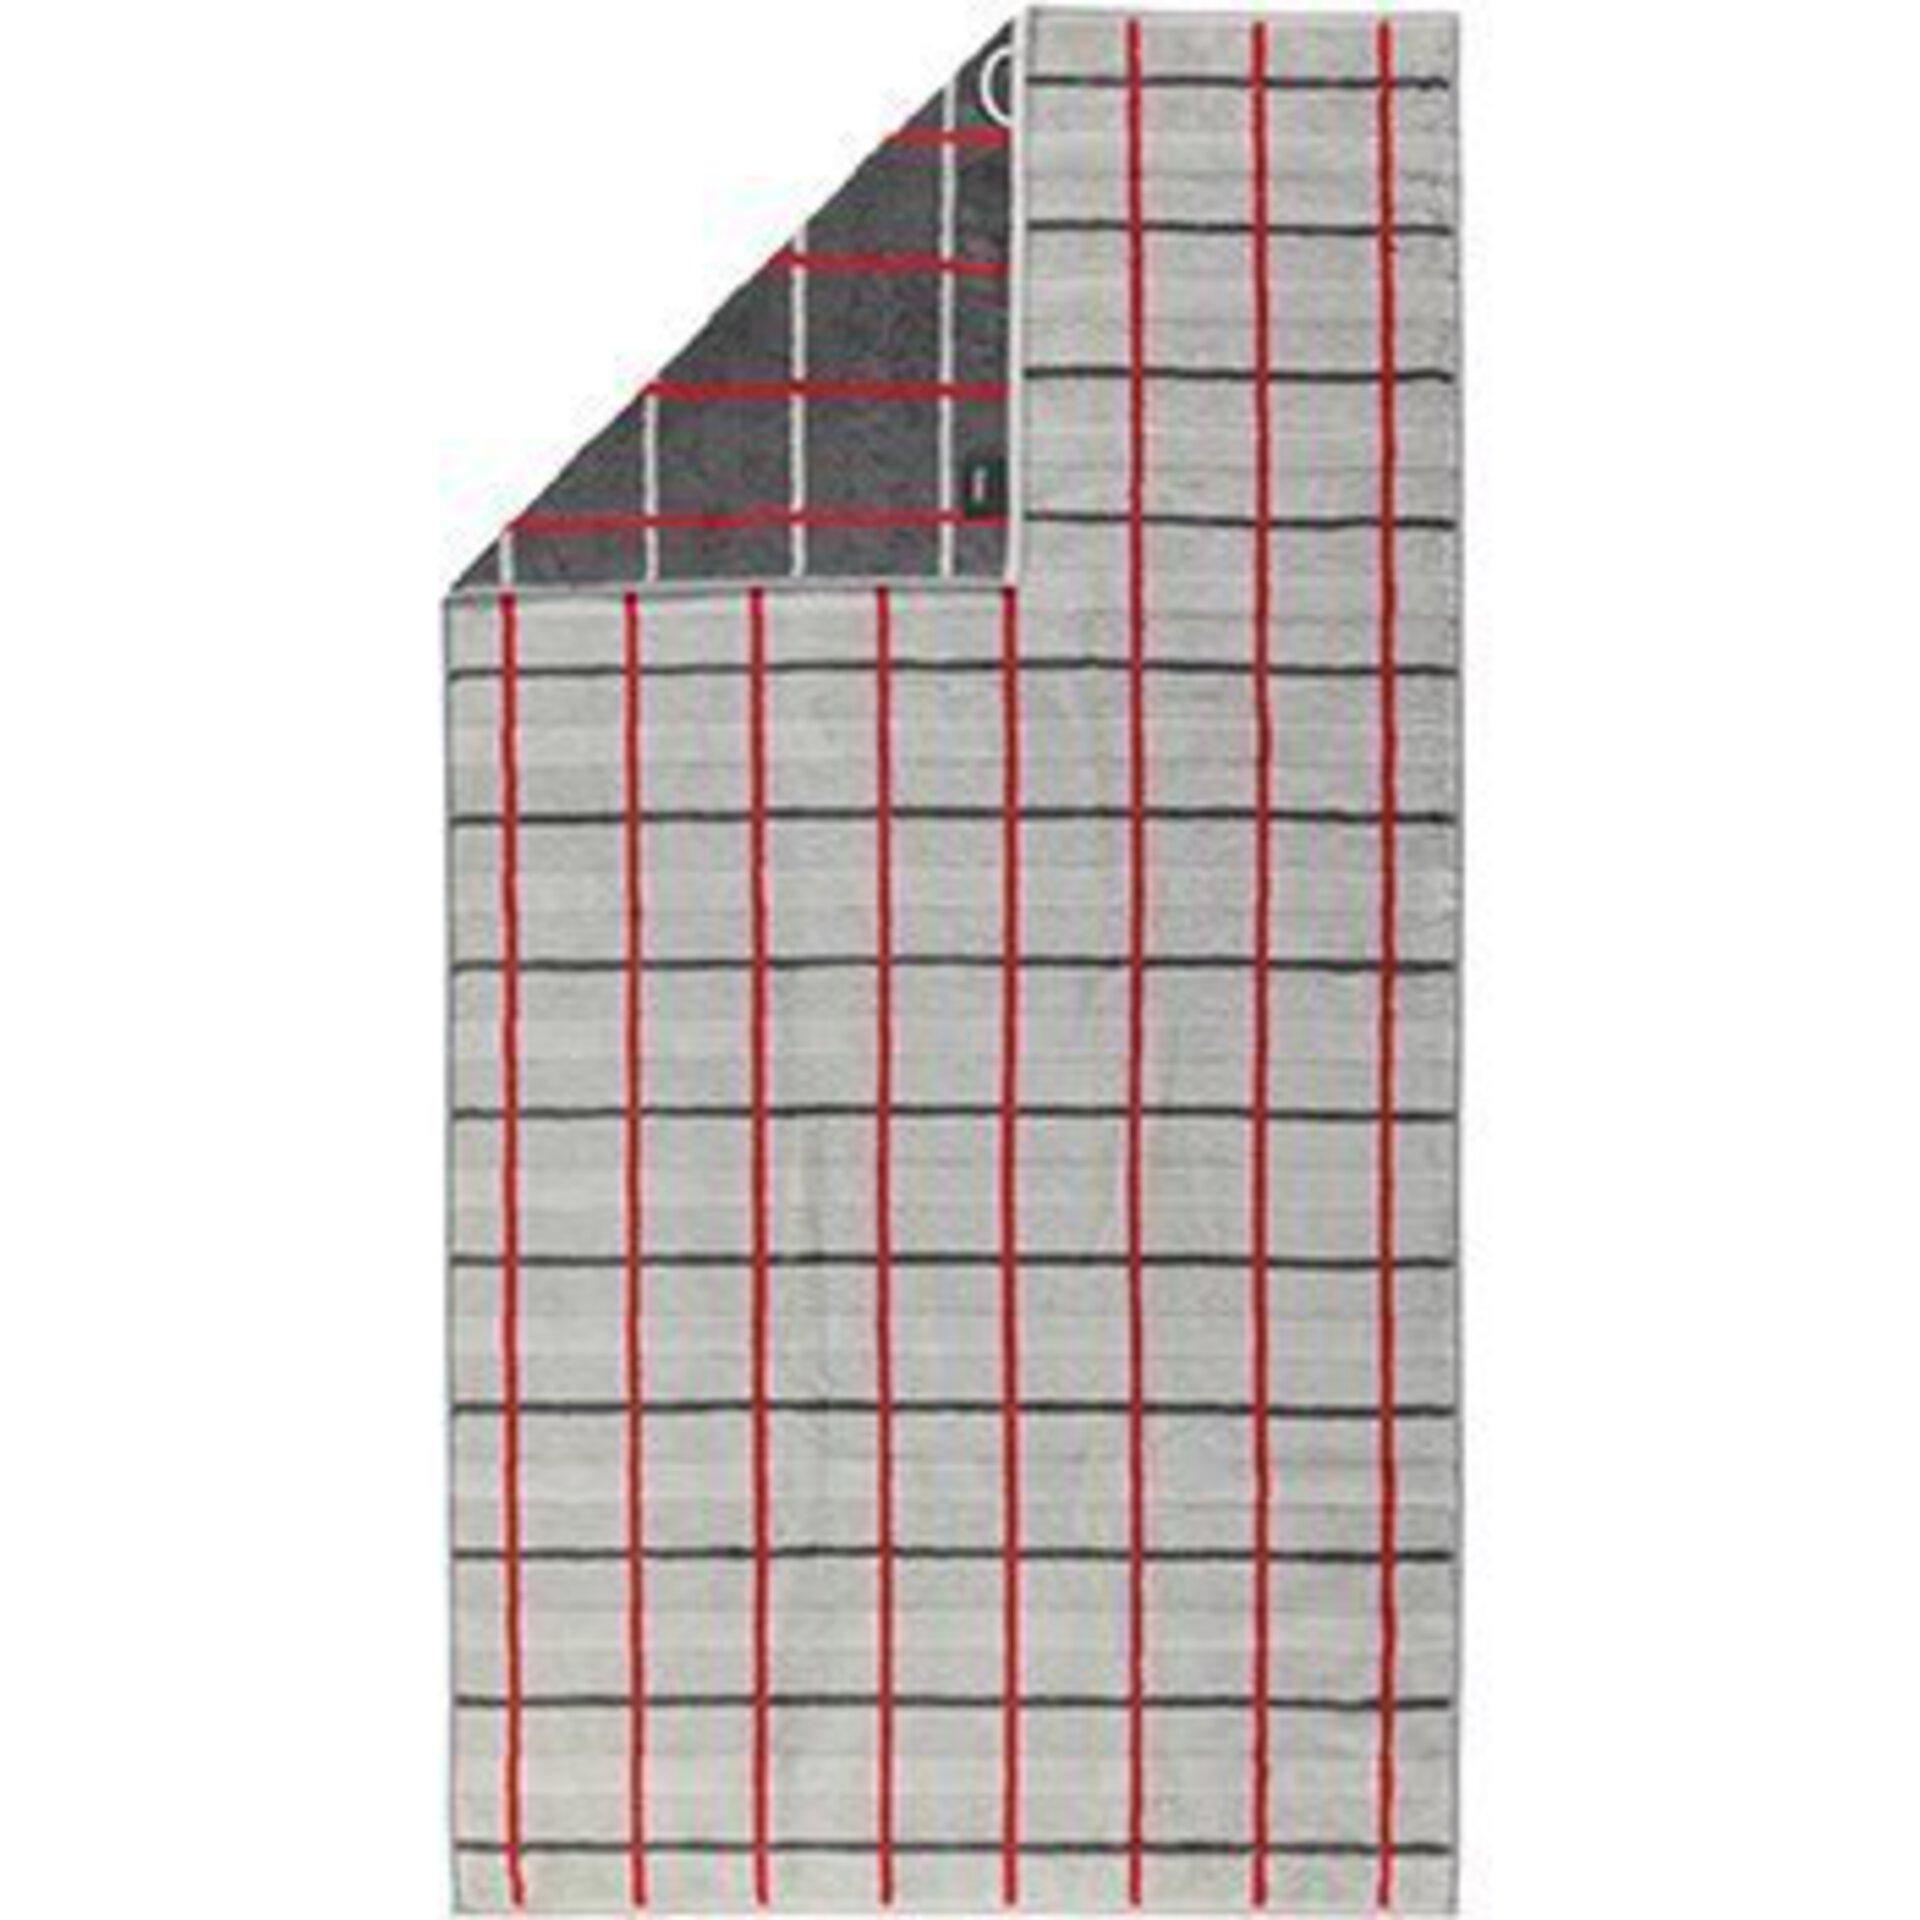 Duschtuch Cawö Textil grau 80 x 150 cm